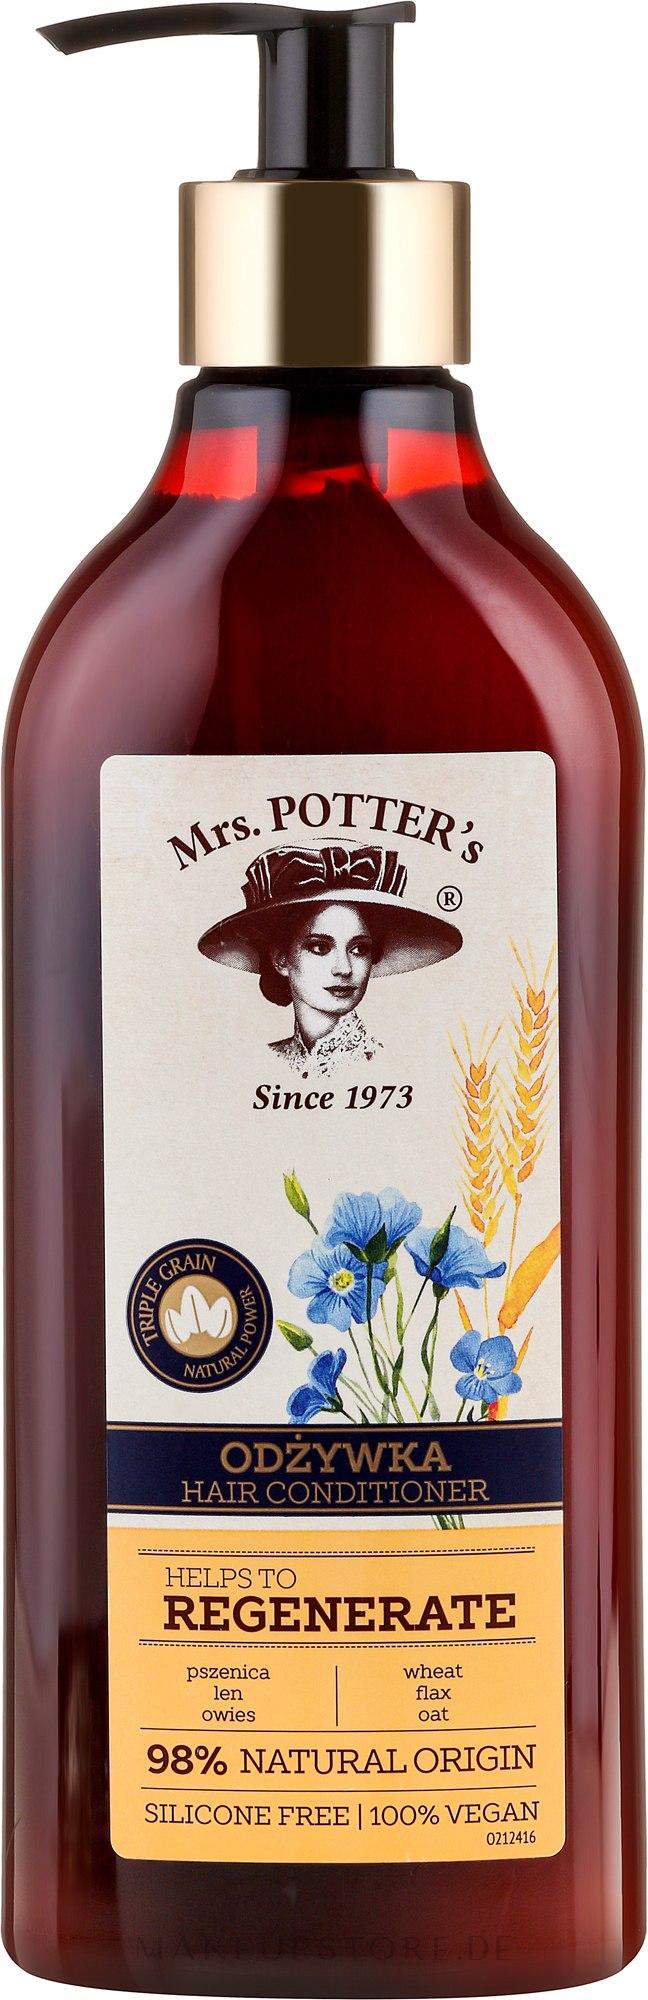 Regenerierende Haarspülung - Mrs. Potter's Helps To Regenerate Hair Conditioner — Bild 390 ml